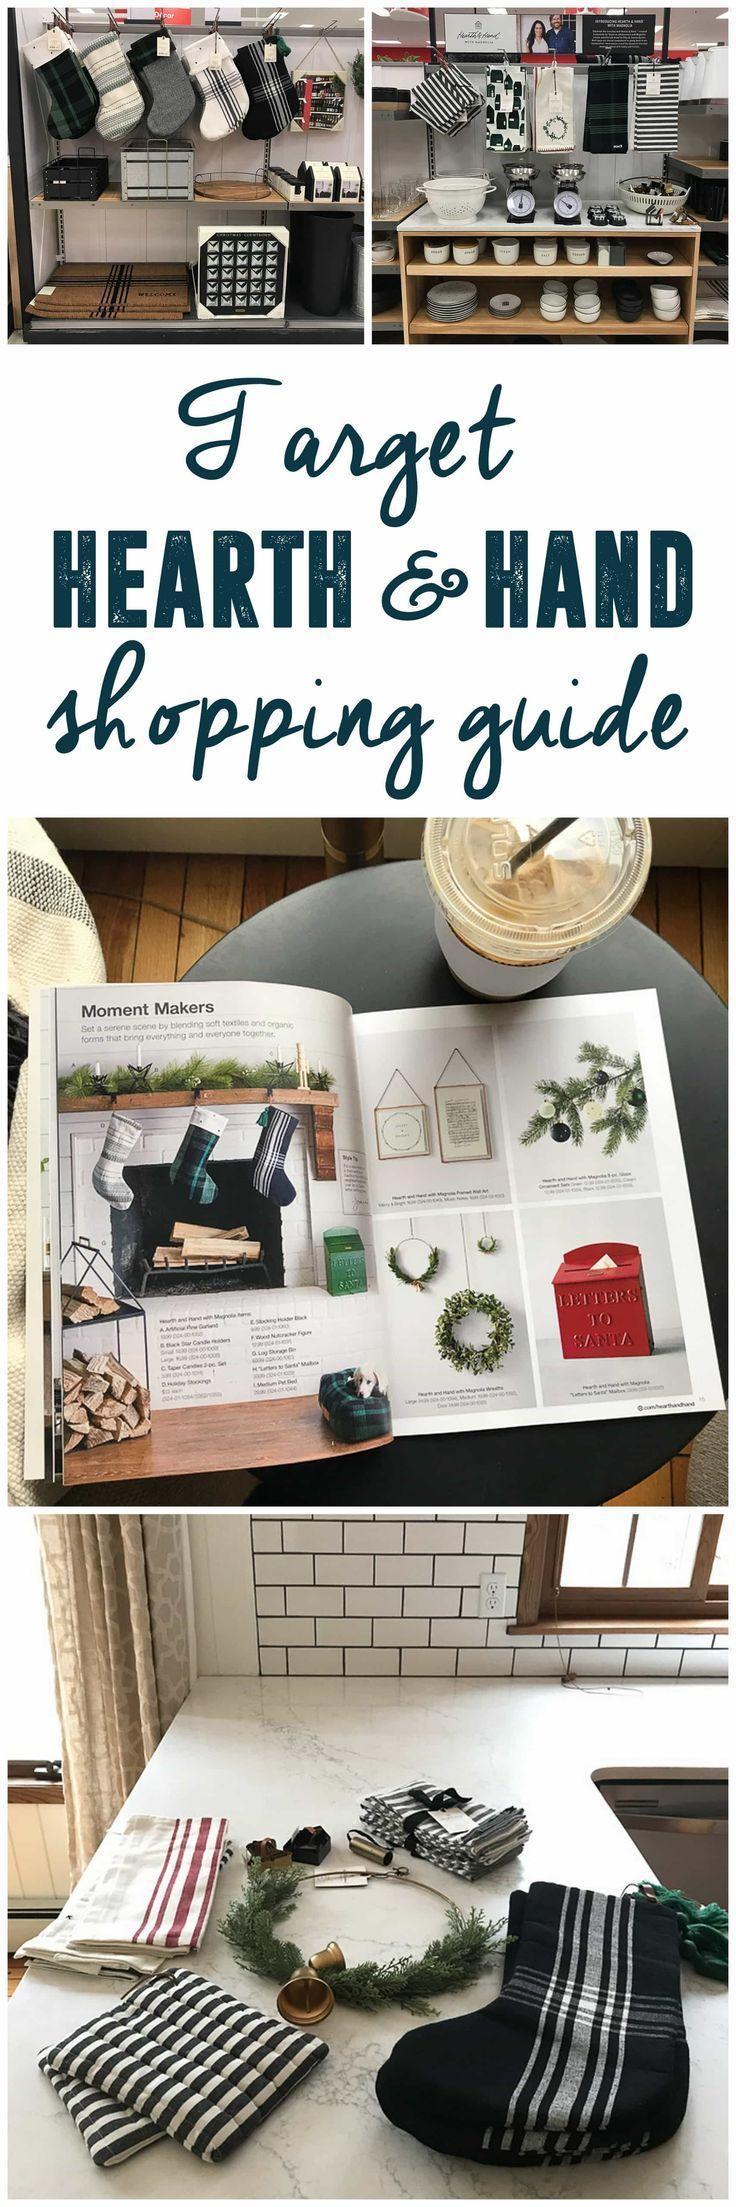 best 25 magnolia home decor ideas on pinterest magnolia. Black Bedroom Furniture Sets. Home Design Ideas